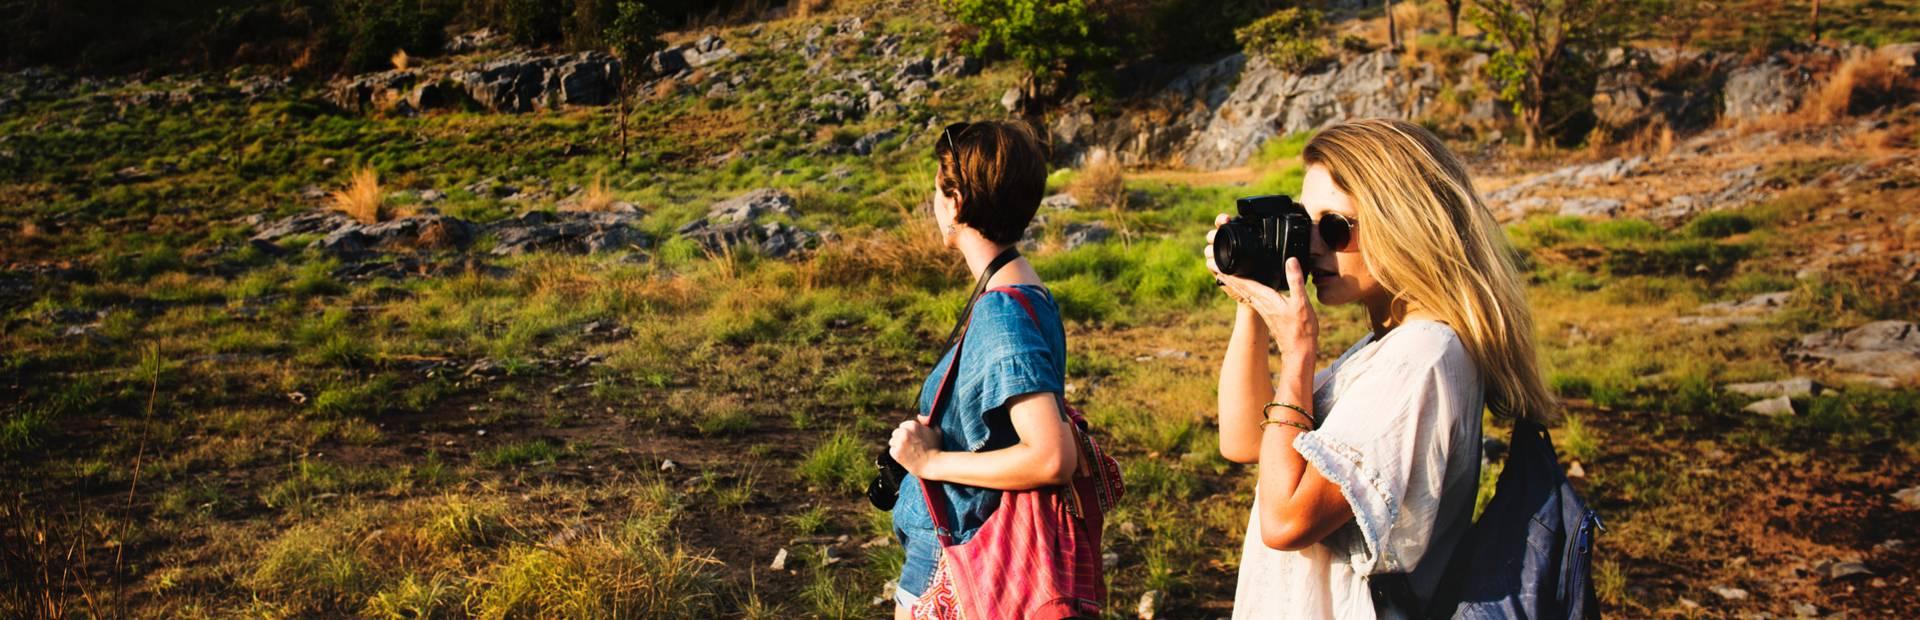 Walking with friends in Pays Bigouden